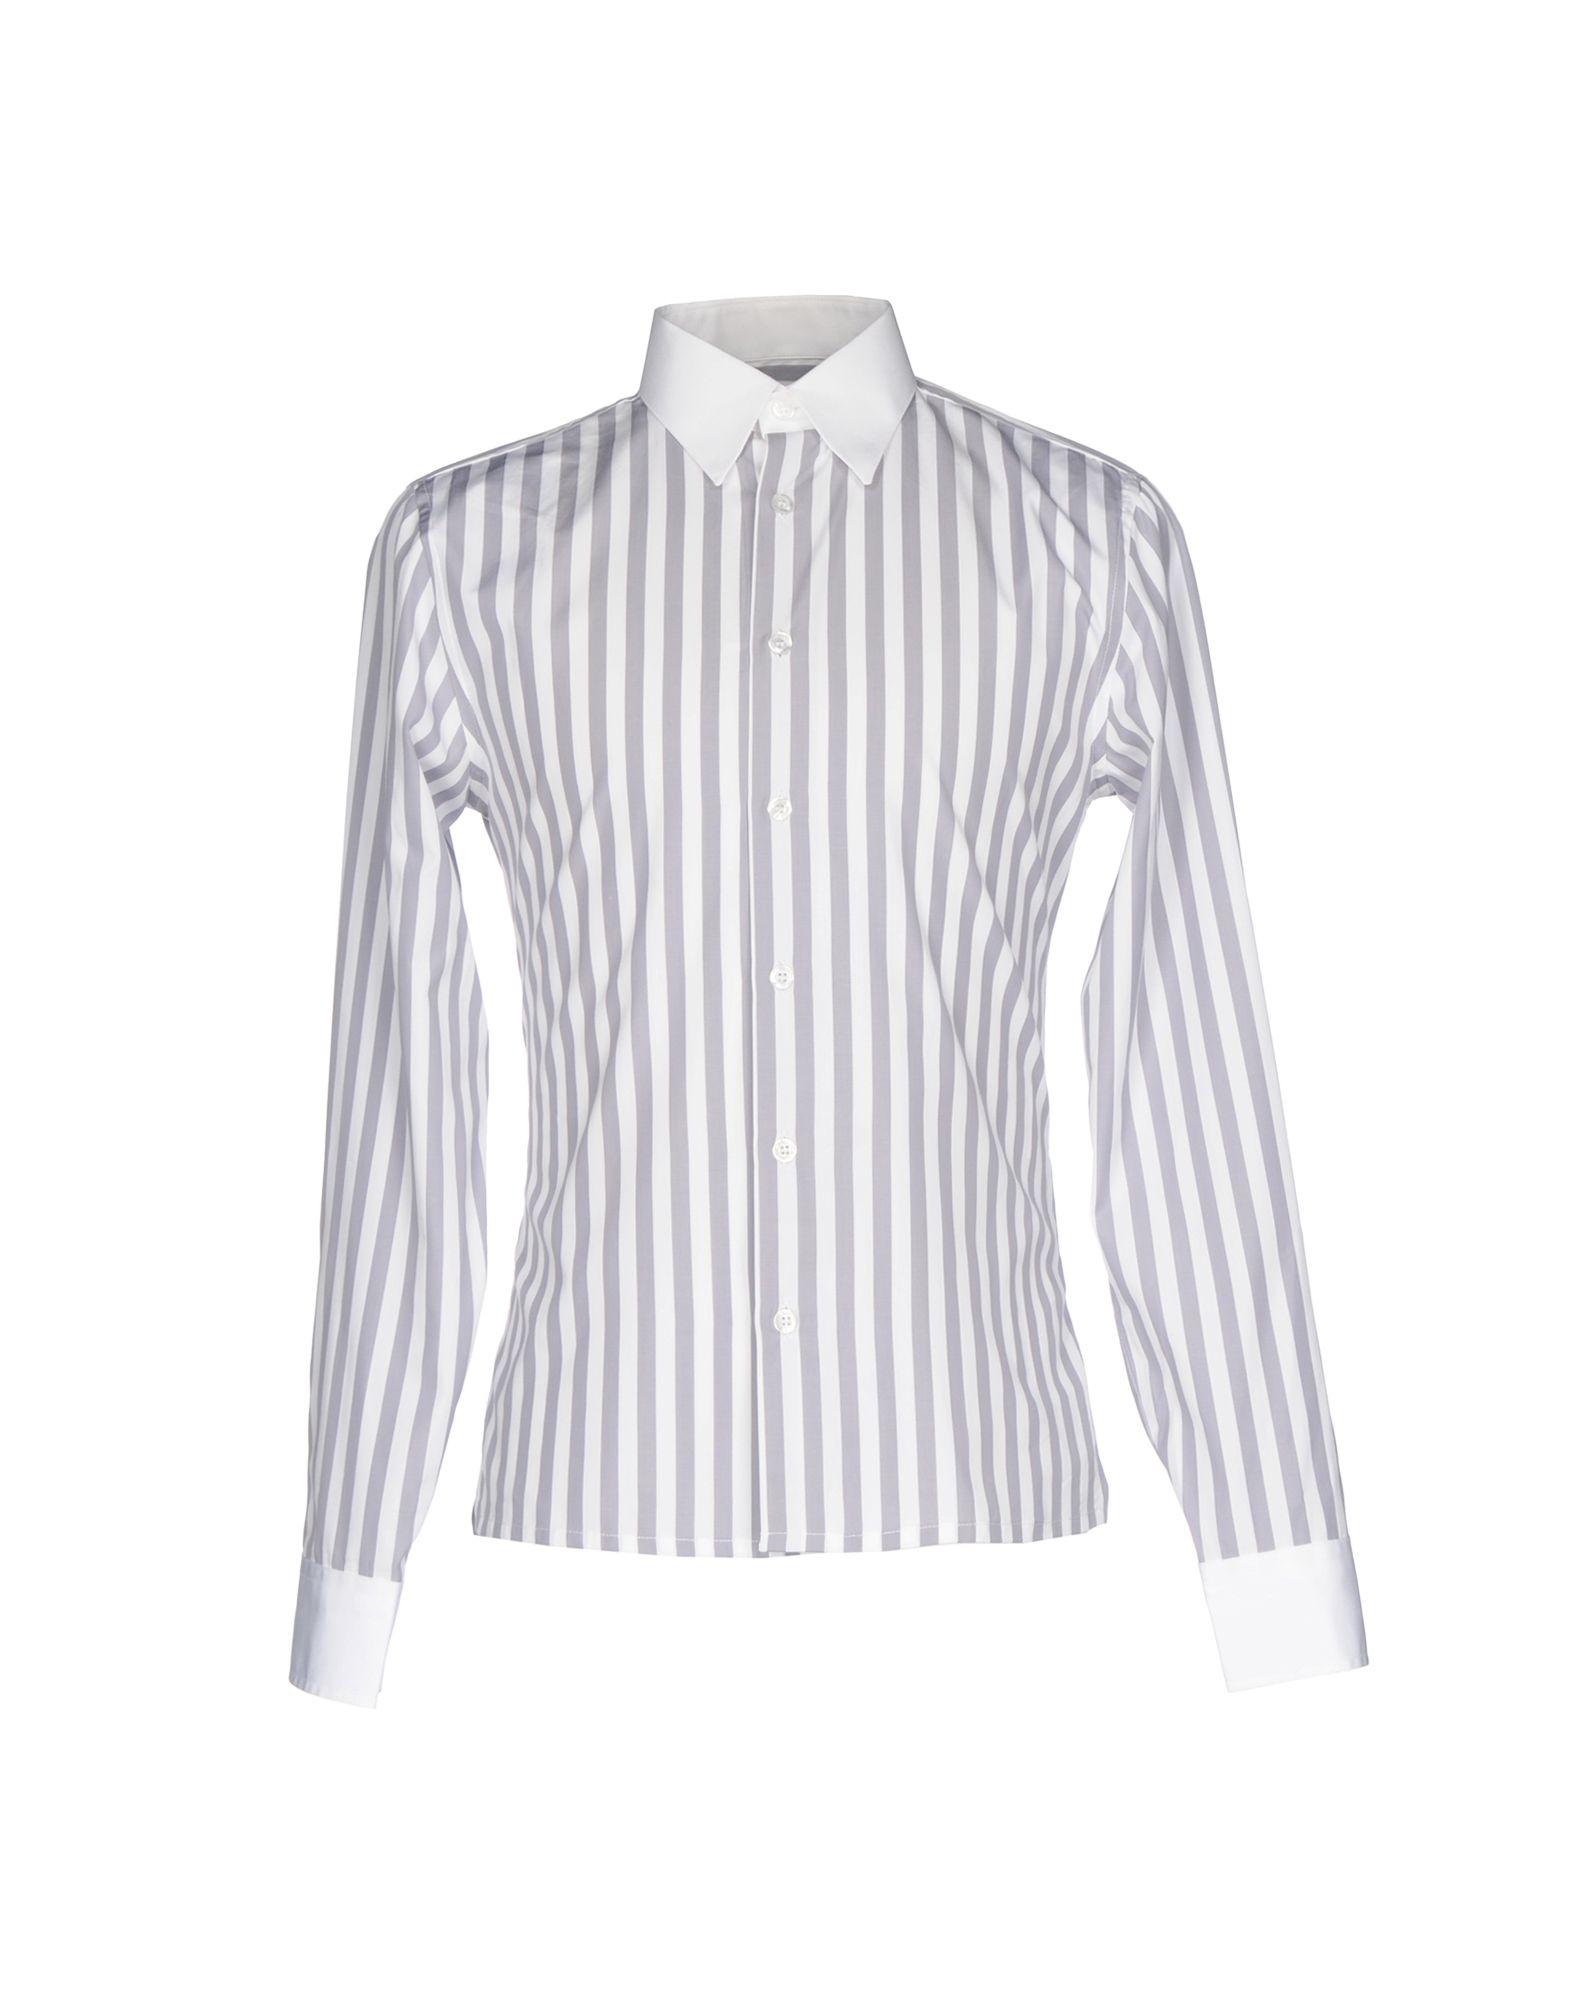 цена  DIRK BIKKEMBERGS SPORT COUTURE Pубашка  онлайн в 2017 году